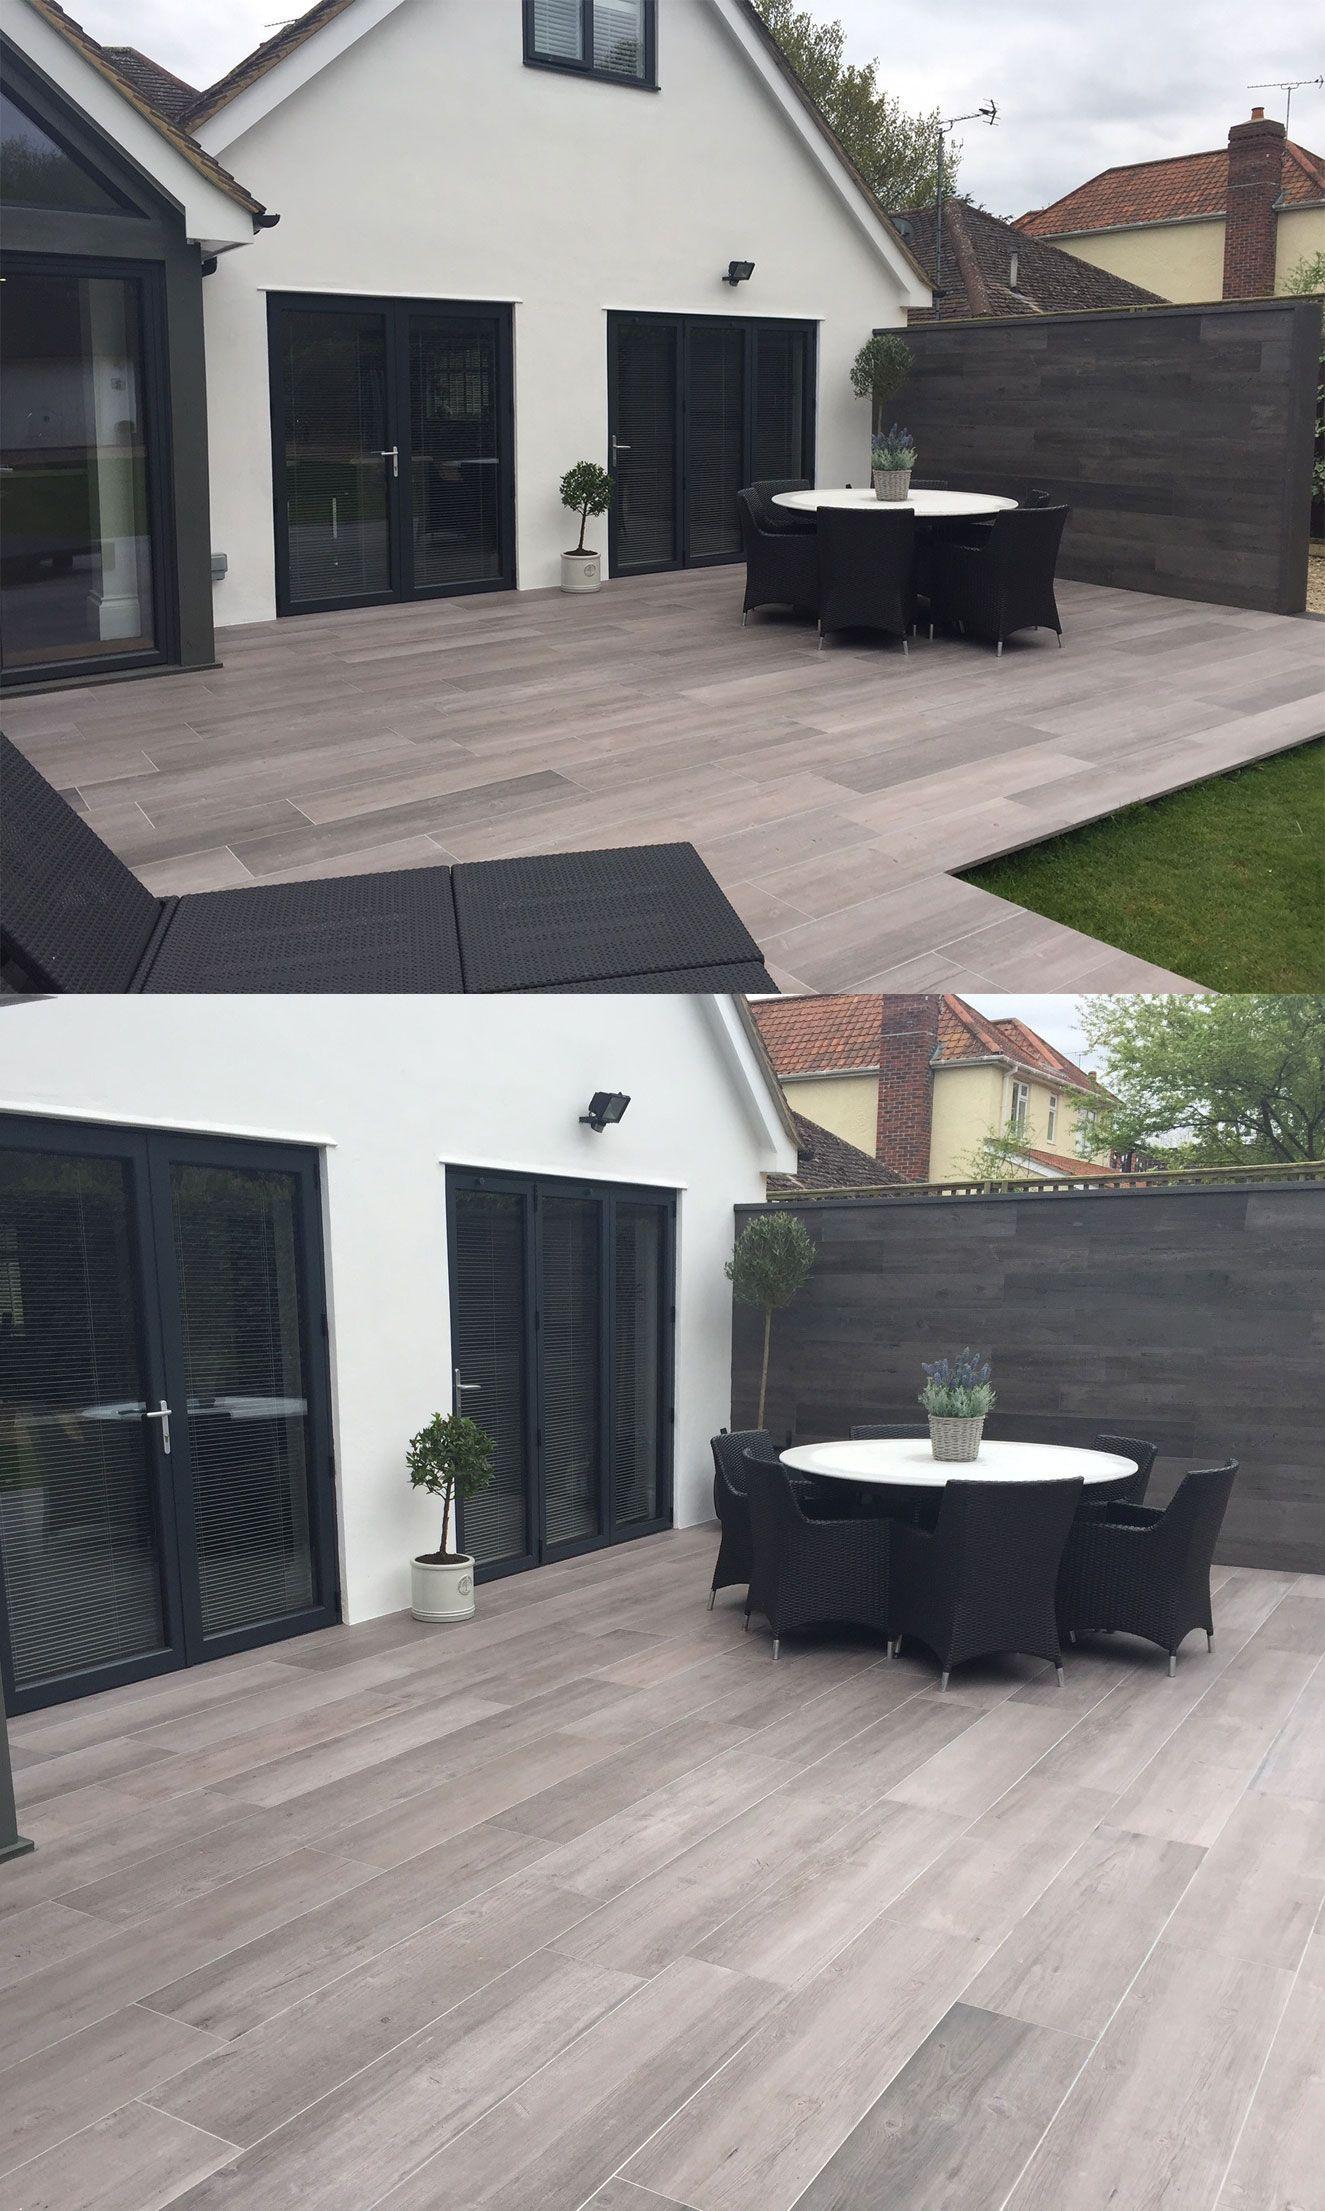 Great modern wood effect patio created using Valverdi ...